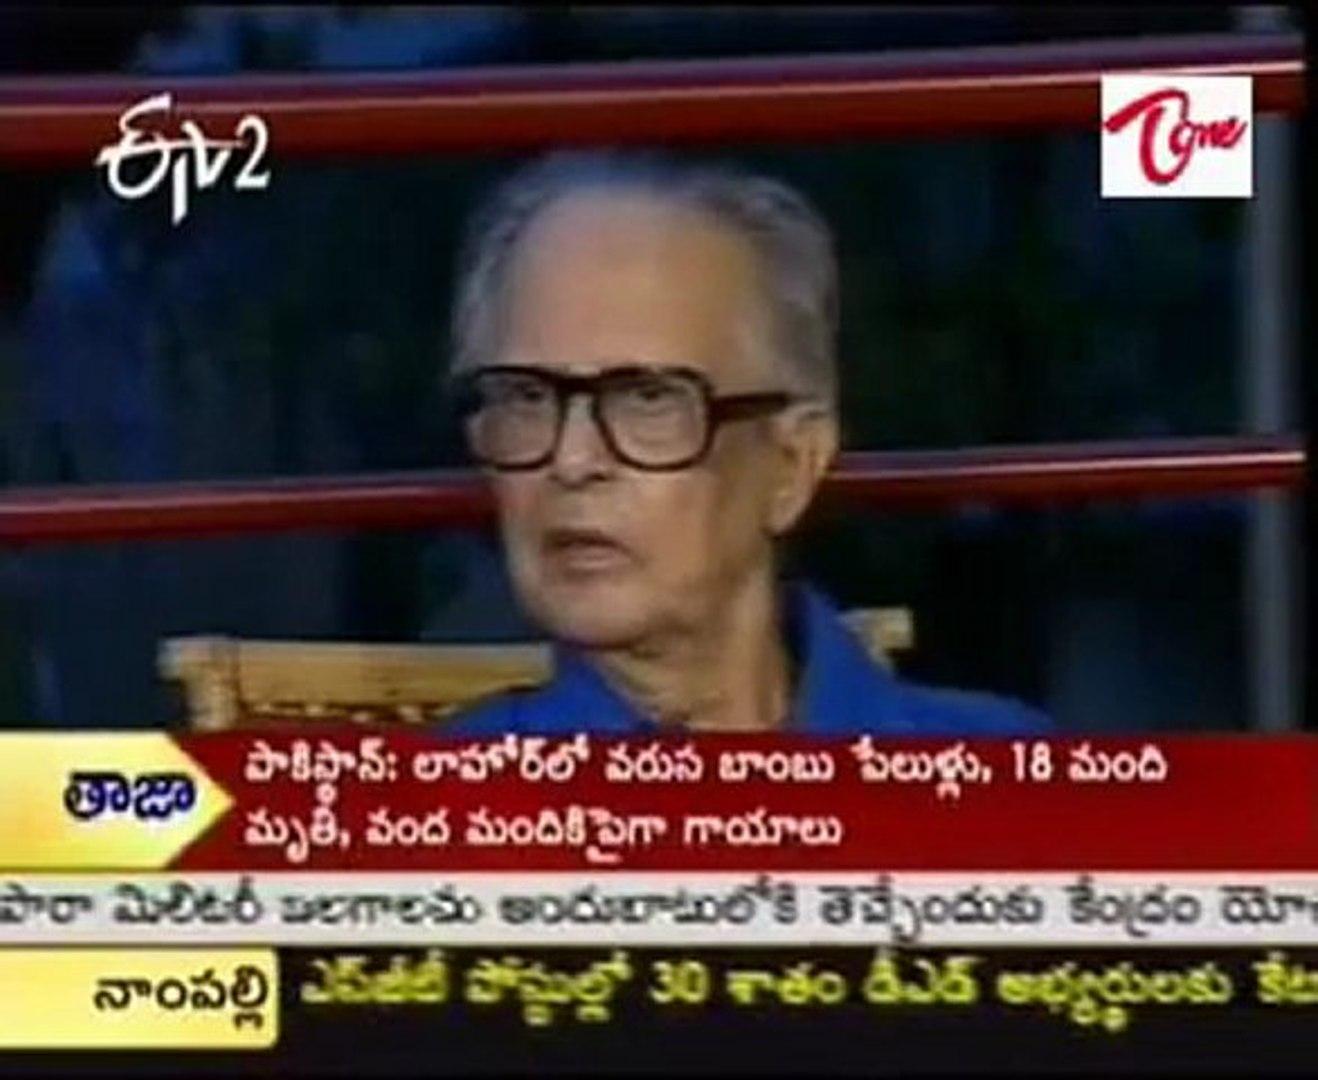 Margadarsi - Your favorite Indian TV show, Cartoonist R.K.Laxman-Part02